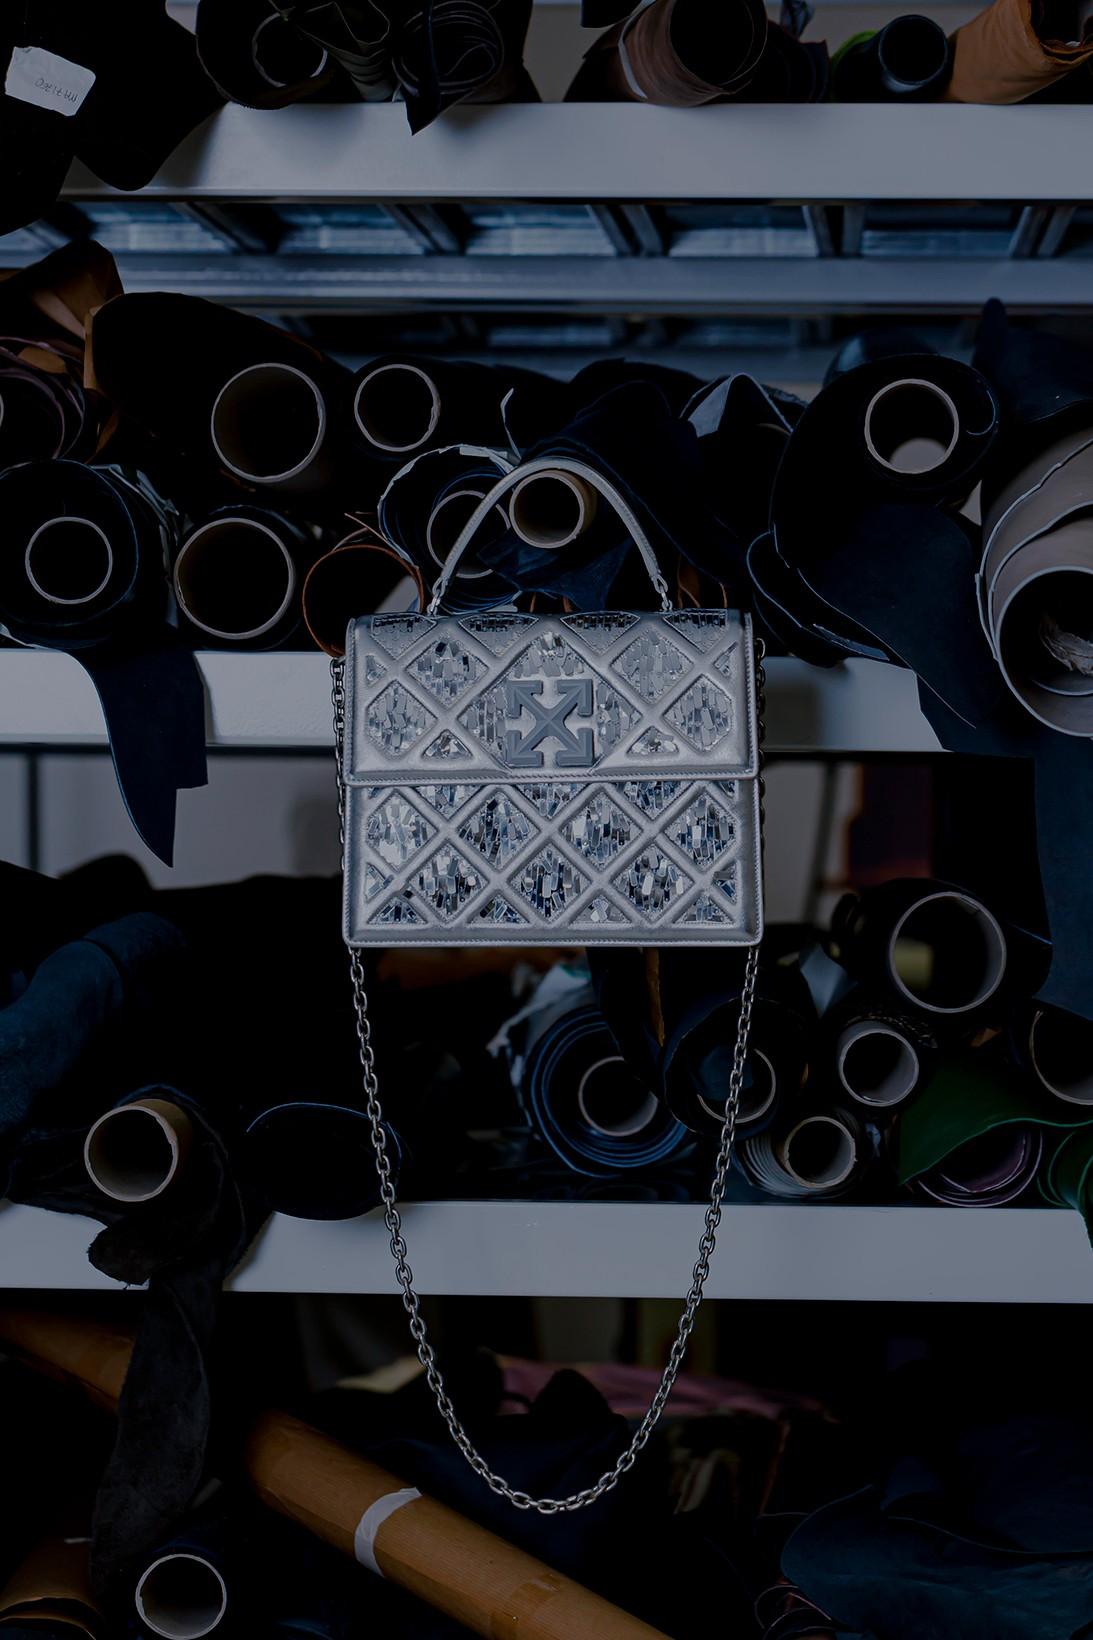 Вирджил Абло сделал для Off-White сумку, вдохновленную пирамидой Лувра (фото 2)